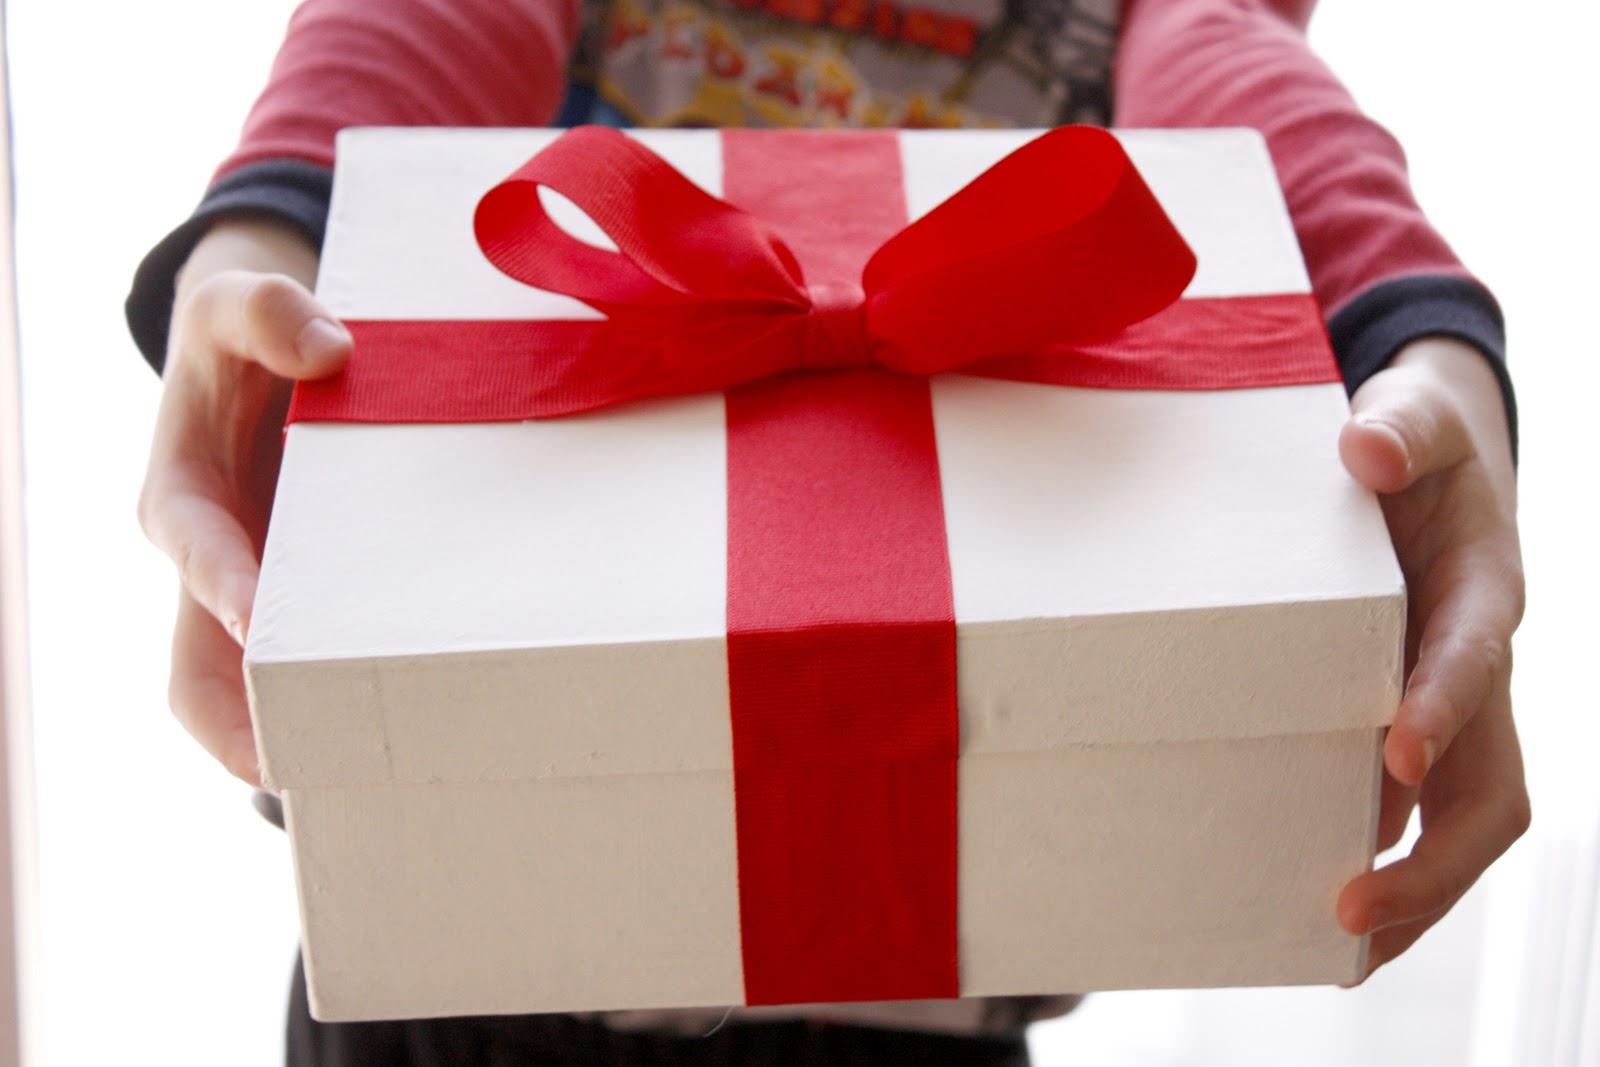 Gift Vouchers for a Guitarist   Gift Voucher Guitars   Gift Vouchers - Guitar Lessons   Gift Cards   Gift ideas for Guitarists